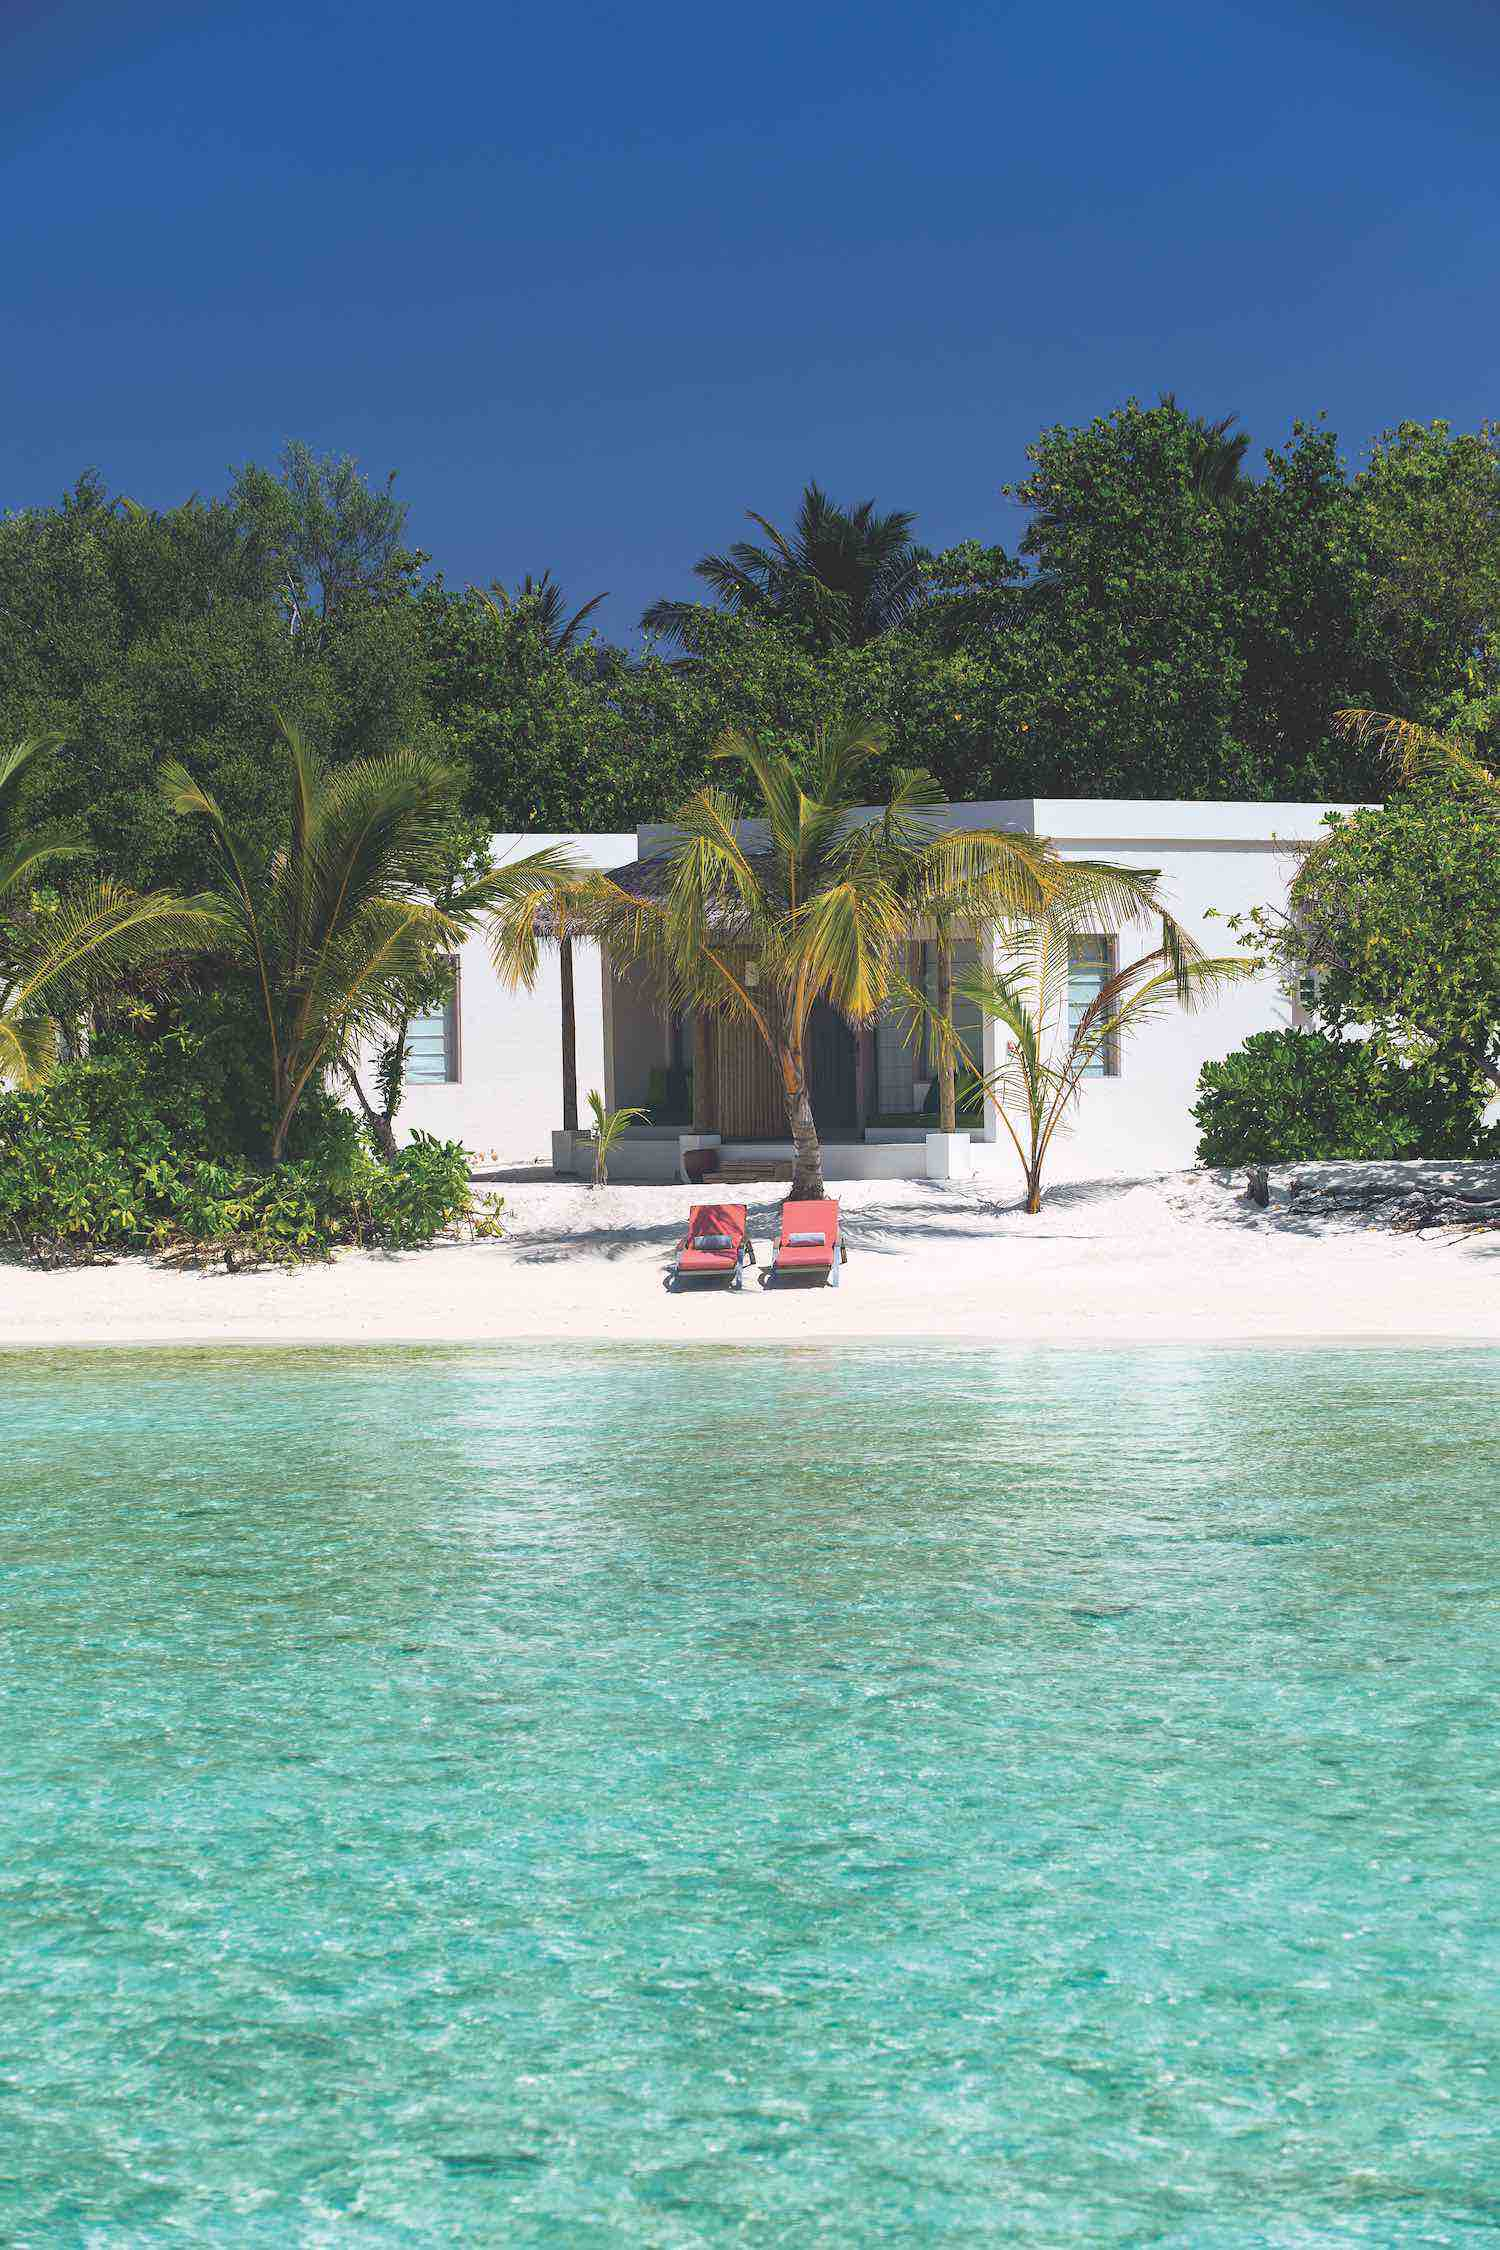 maldives-oblu-by-atmosphere-at-helengeli-deluxe-beach-villa-holiday-honeymoon-vacation-invite-to-paradise.jpg